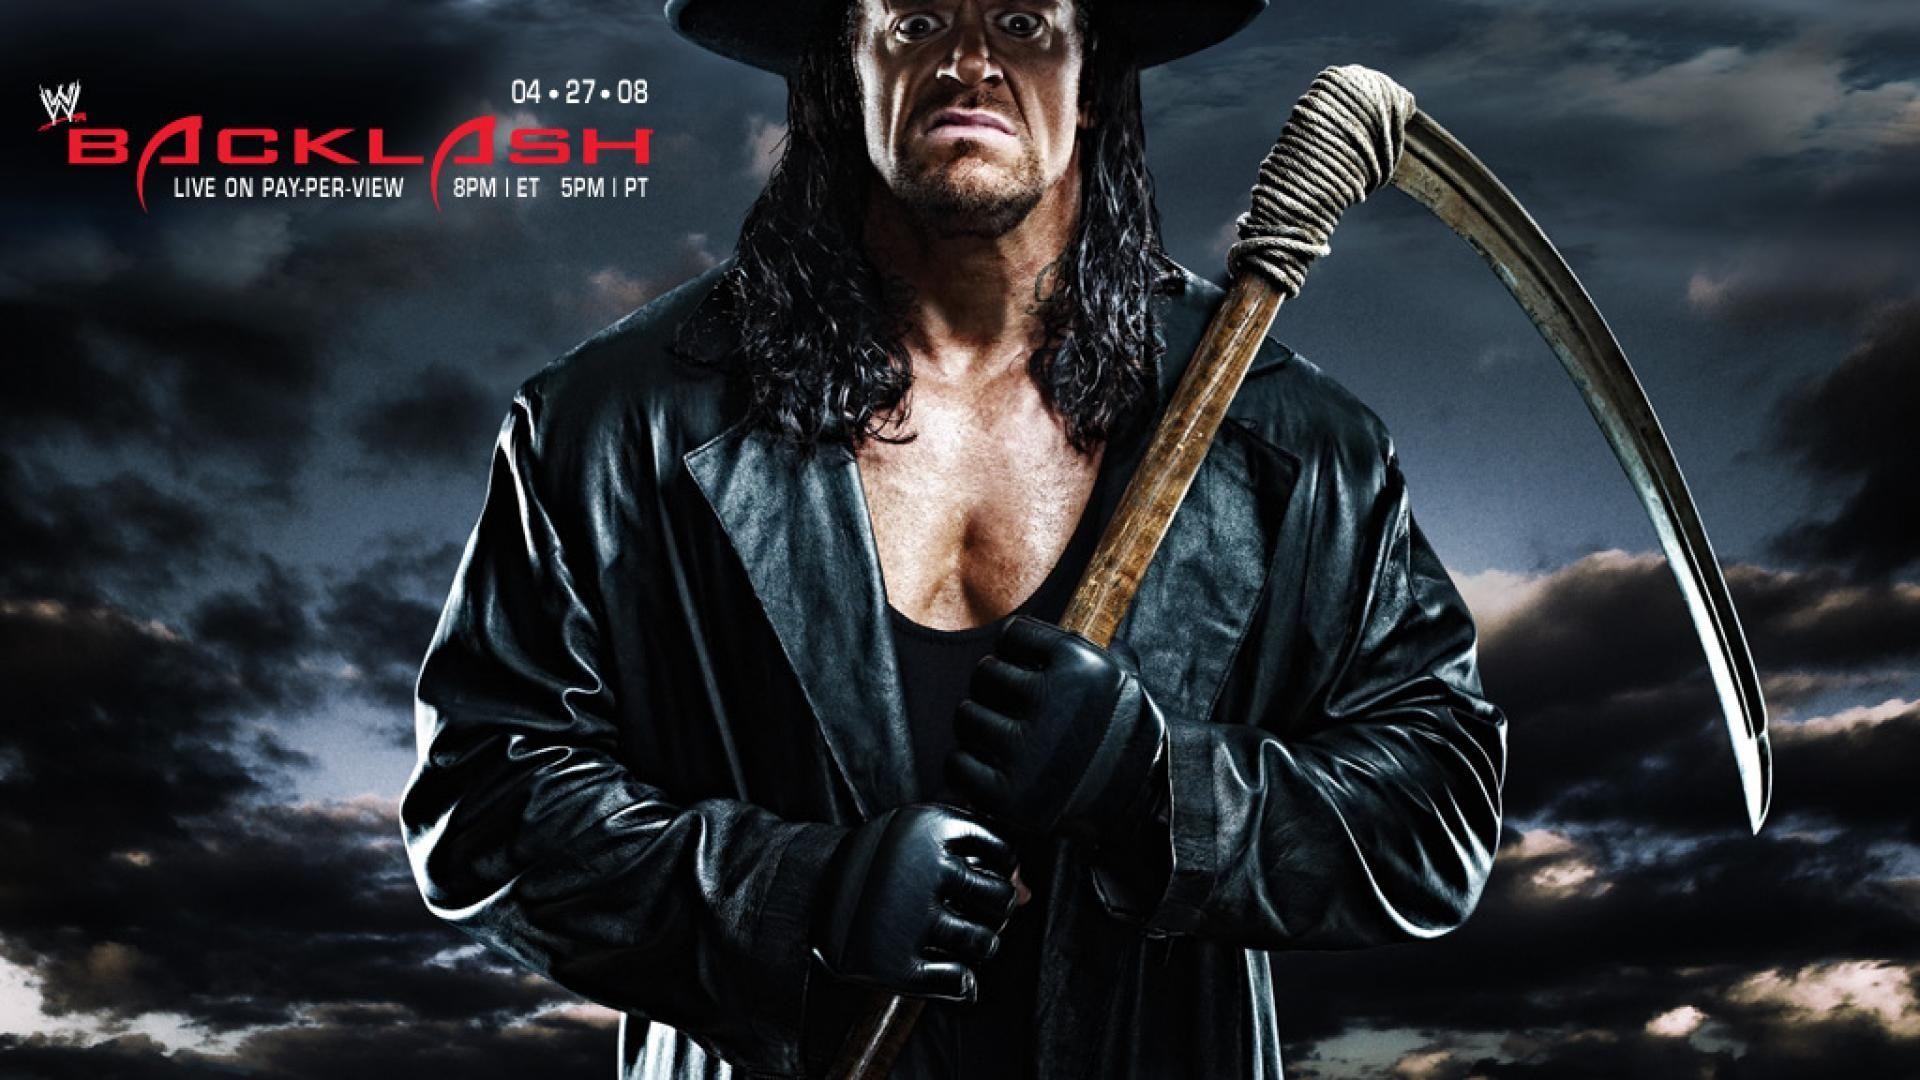 WWE Sting Wallpaper HD Quality WWE Sting Images WWE Sting